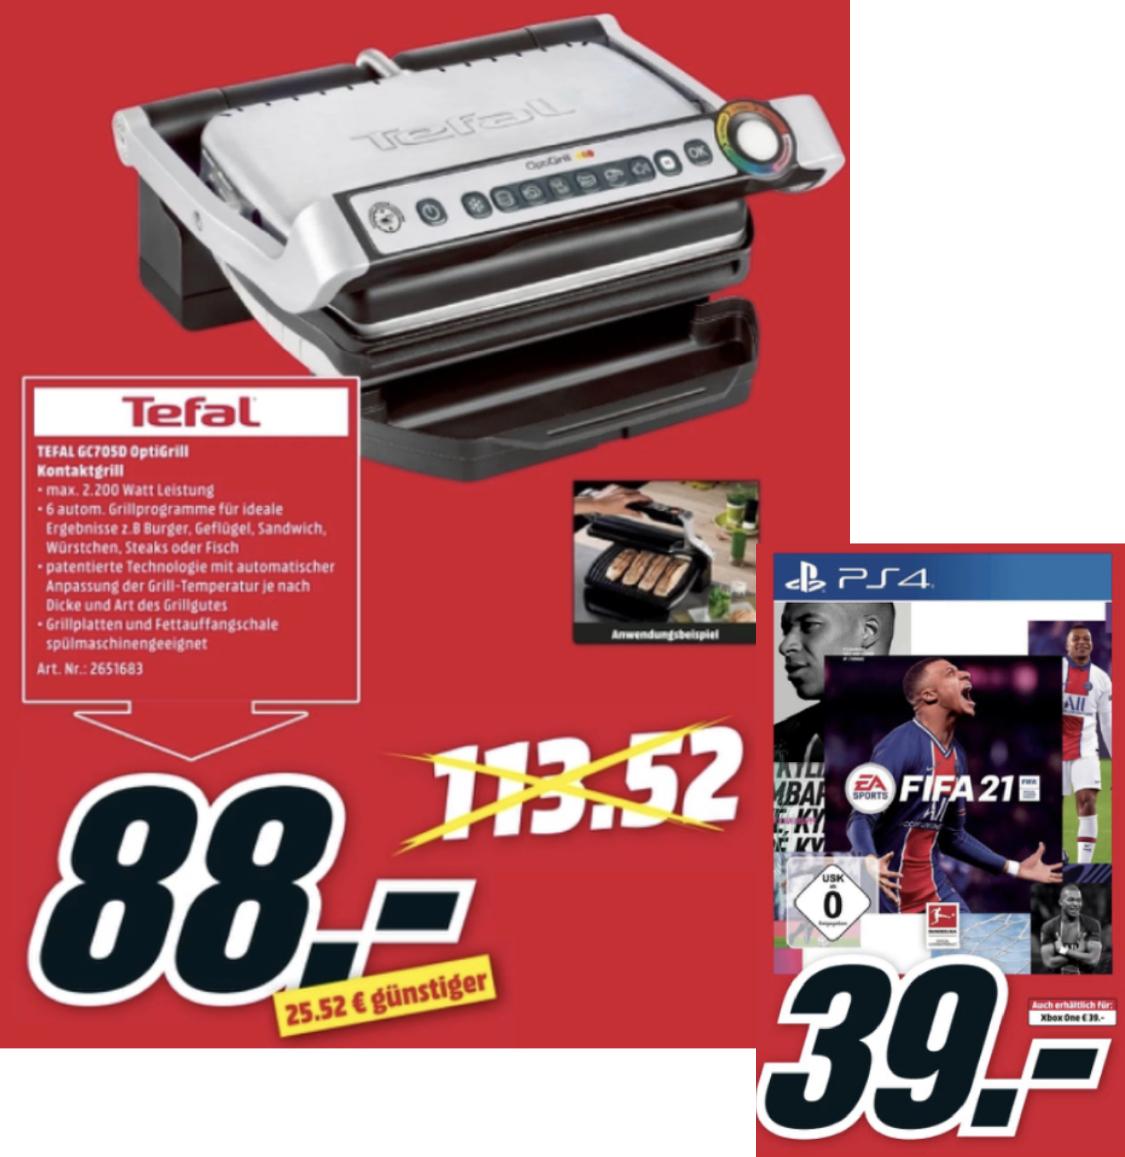 [Lokal MM Berlin] TEFAL Optigrill GC705D für 88€ / FiFA 21 für Playstation 4 für 39€ usw. am verkaufsoffenen Sonntag